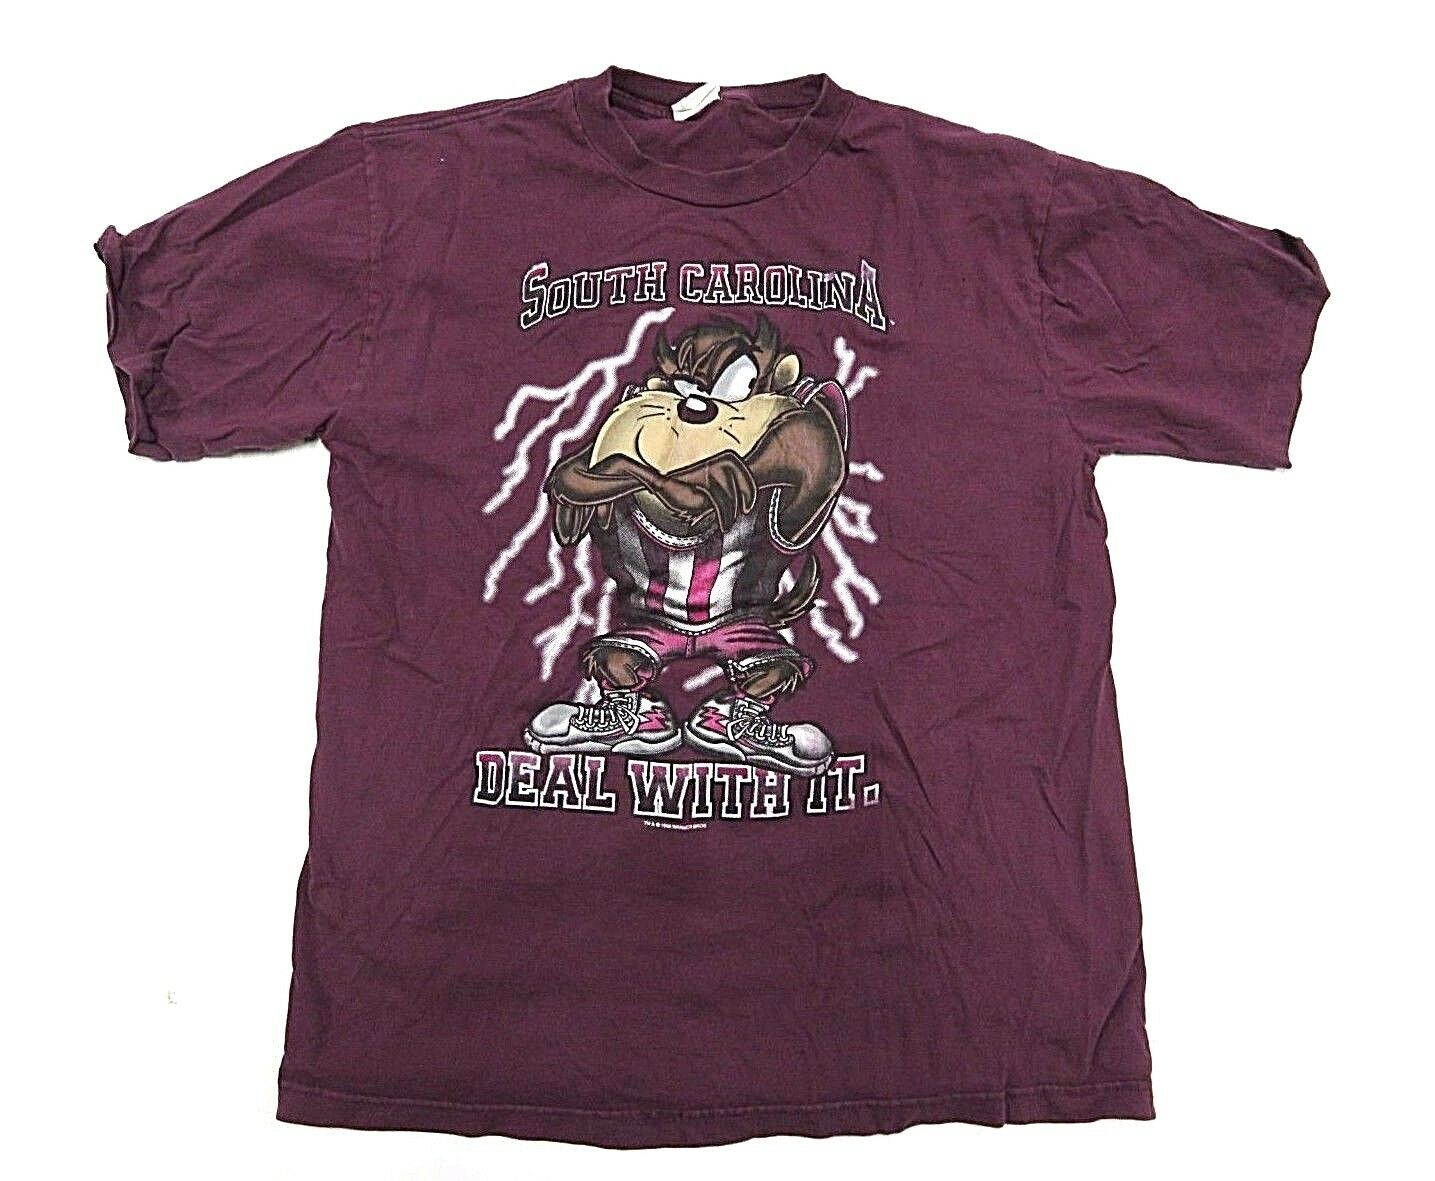 1995 TnT South Carolina Maroon Tasmanian Devil Looney Tunes Graphic Men's Shirt